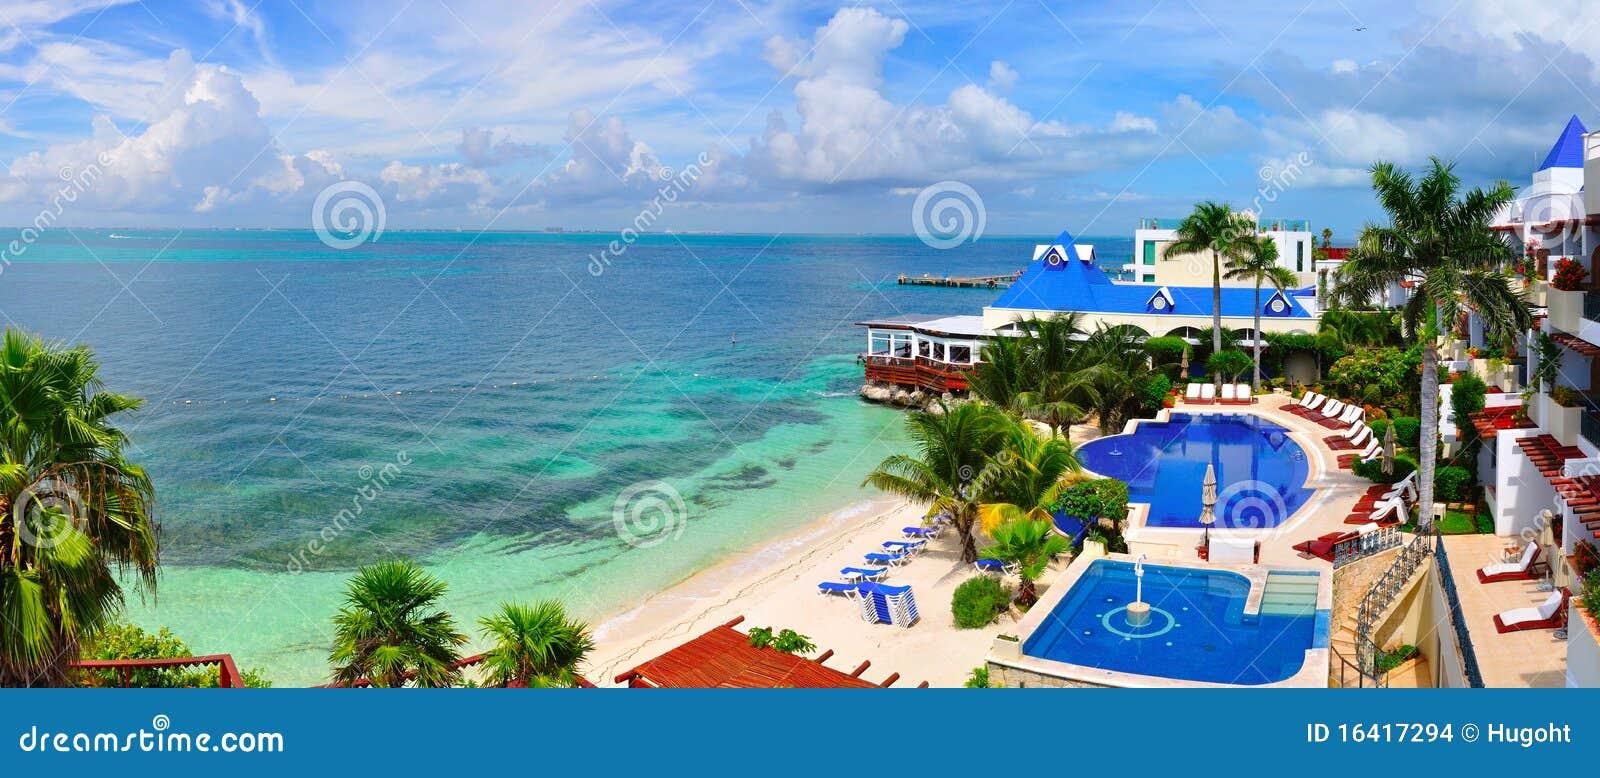 Caribbean Beach Resort Mexico